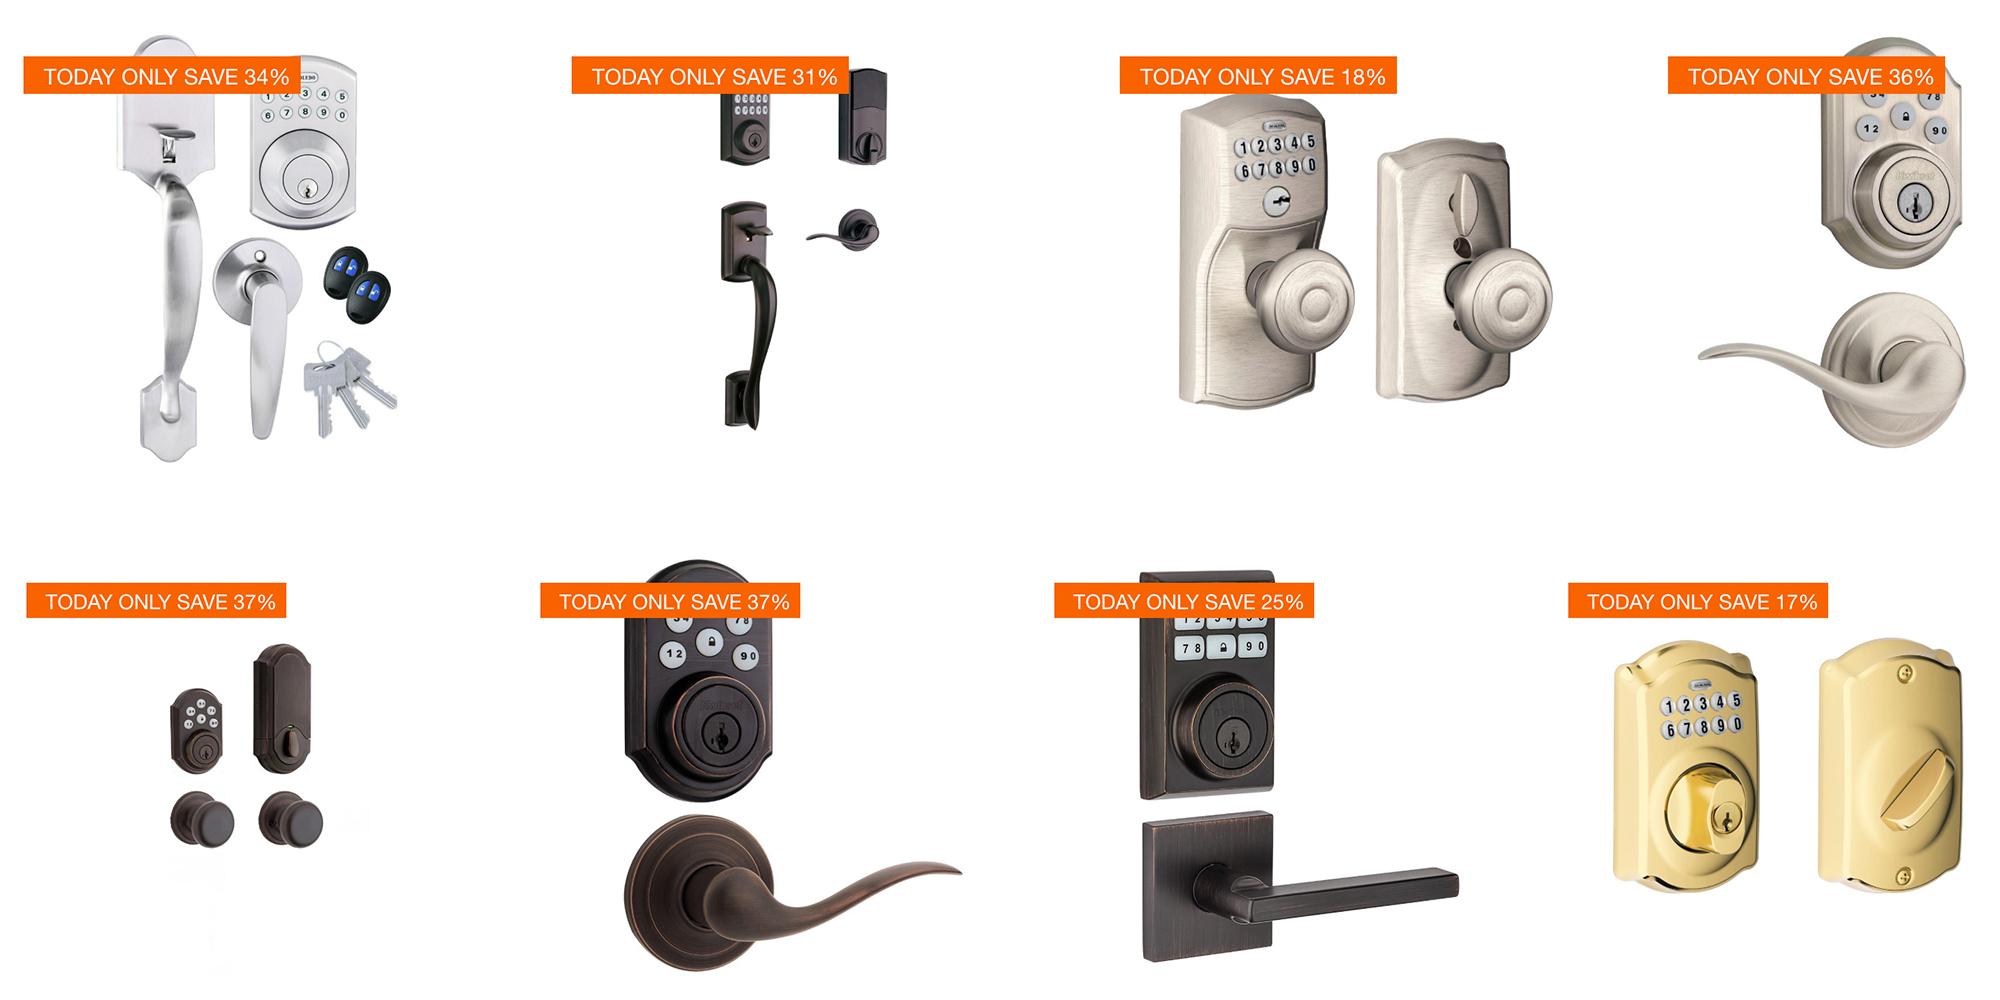 Home Depot's smart lock sale has deals from $74: Kwikset, Schlage, more